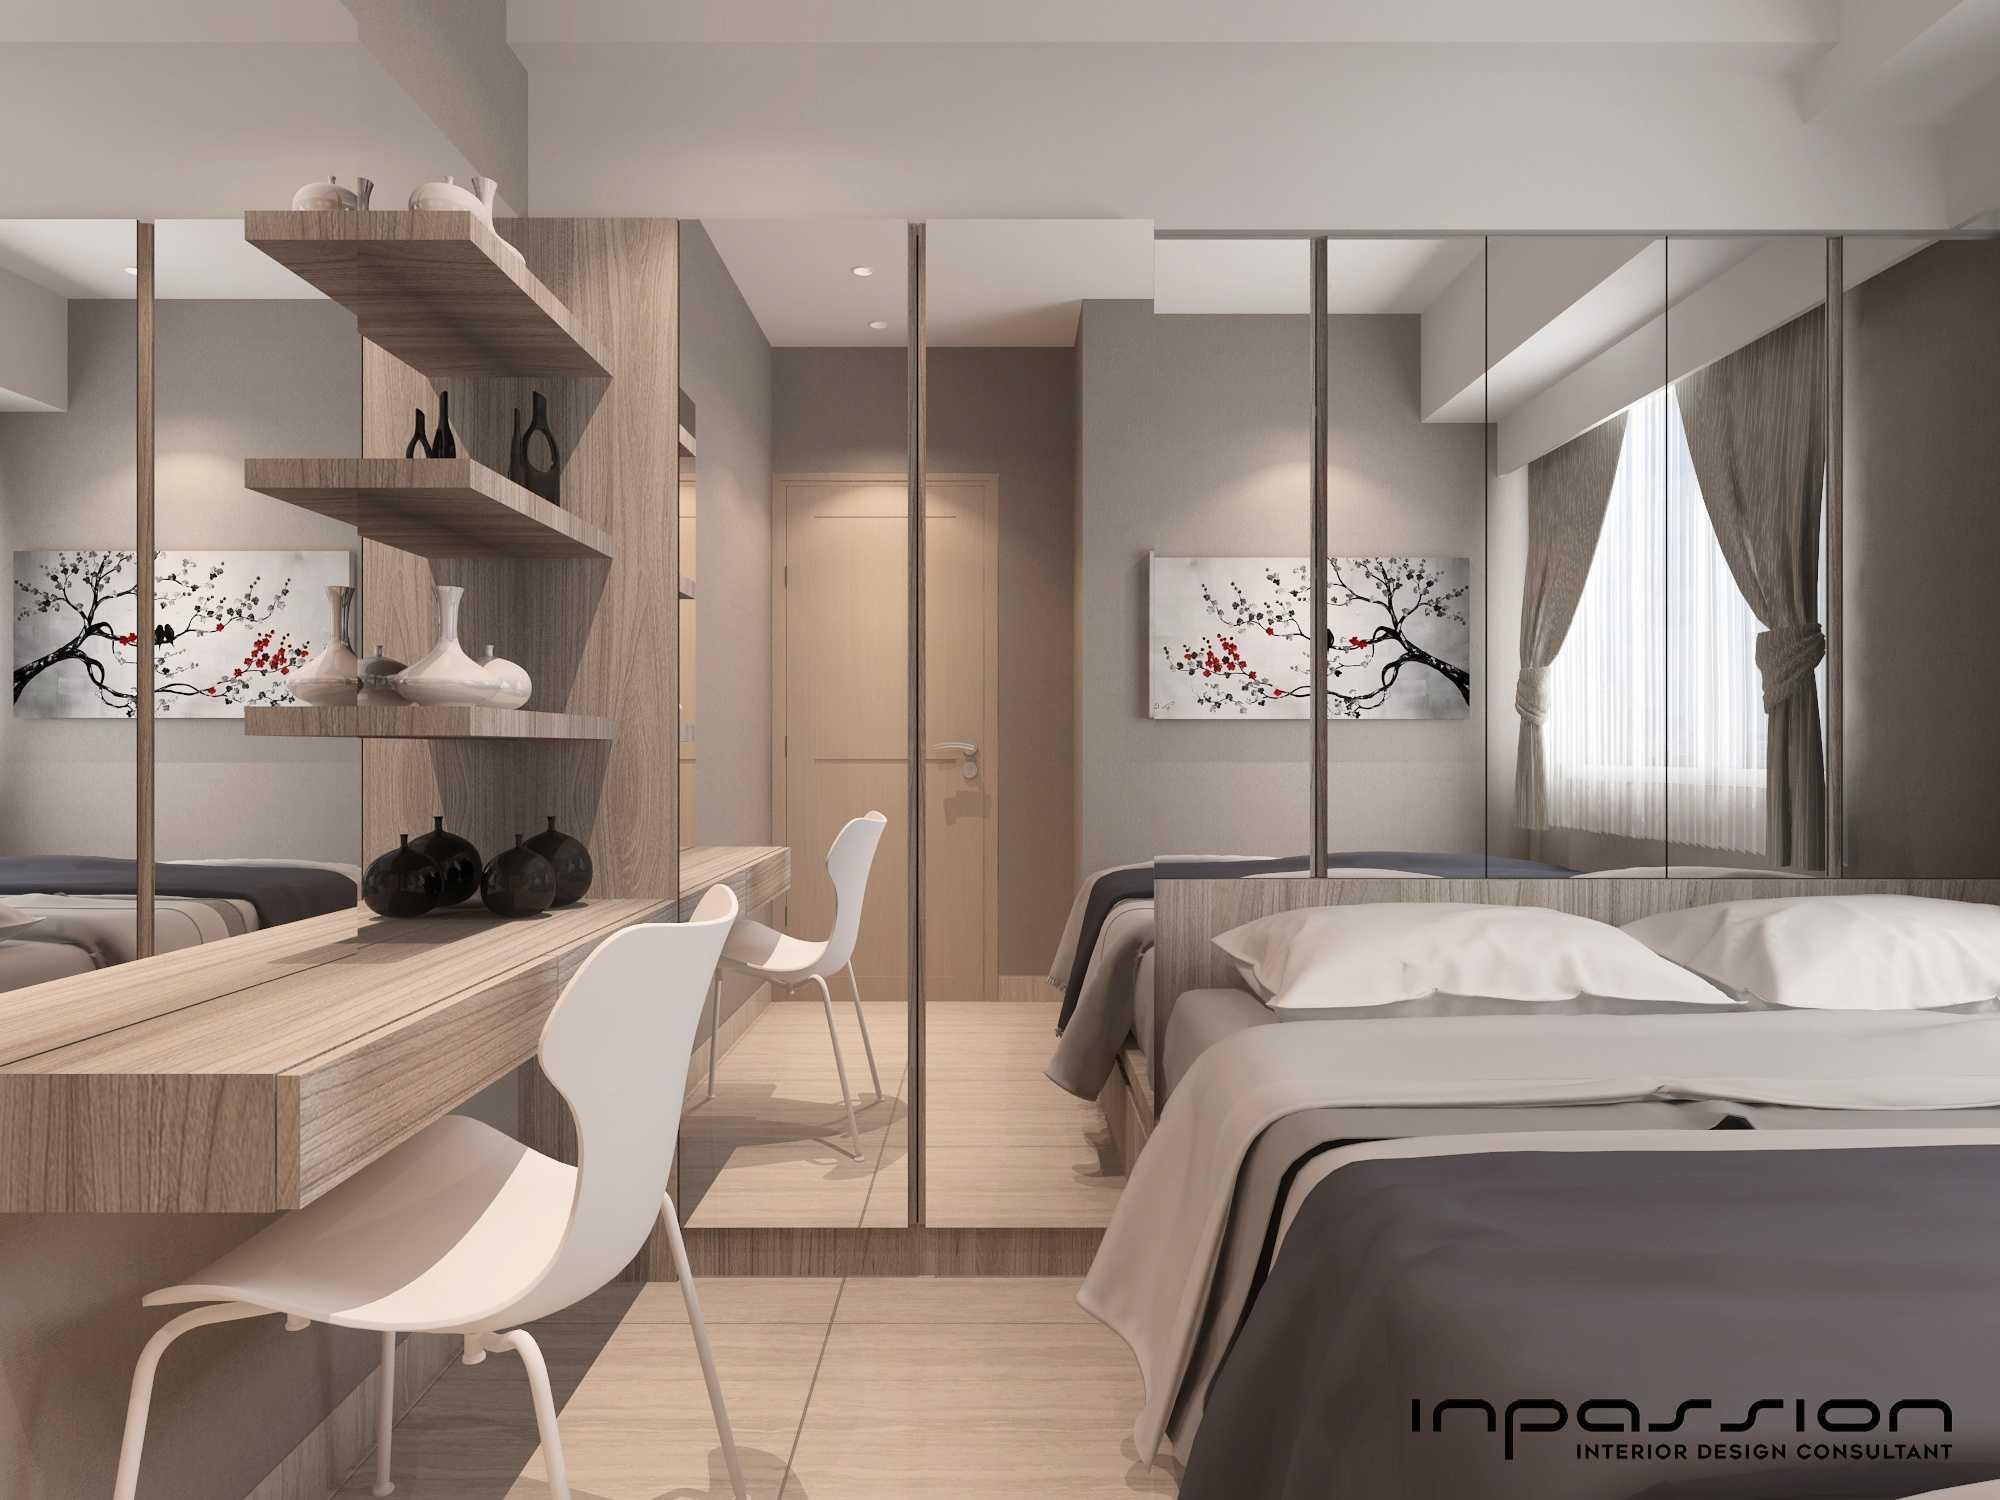 Inpassion Interior Design Educity Apartemen 3 Bedroom Surabaya City, East Java, Indonesia Surabaya City, East Java, Indonesia Img20170507181318679 Kontemporer  31588